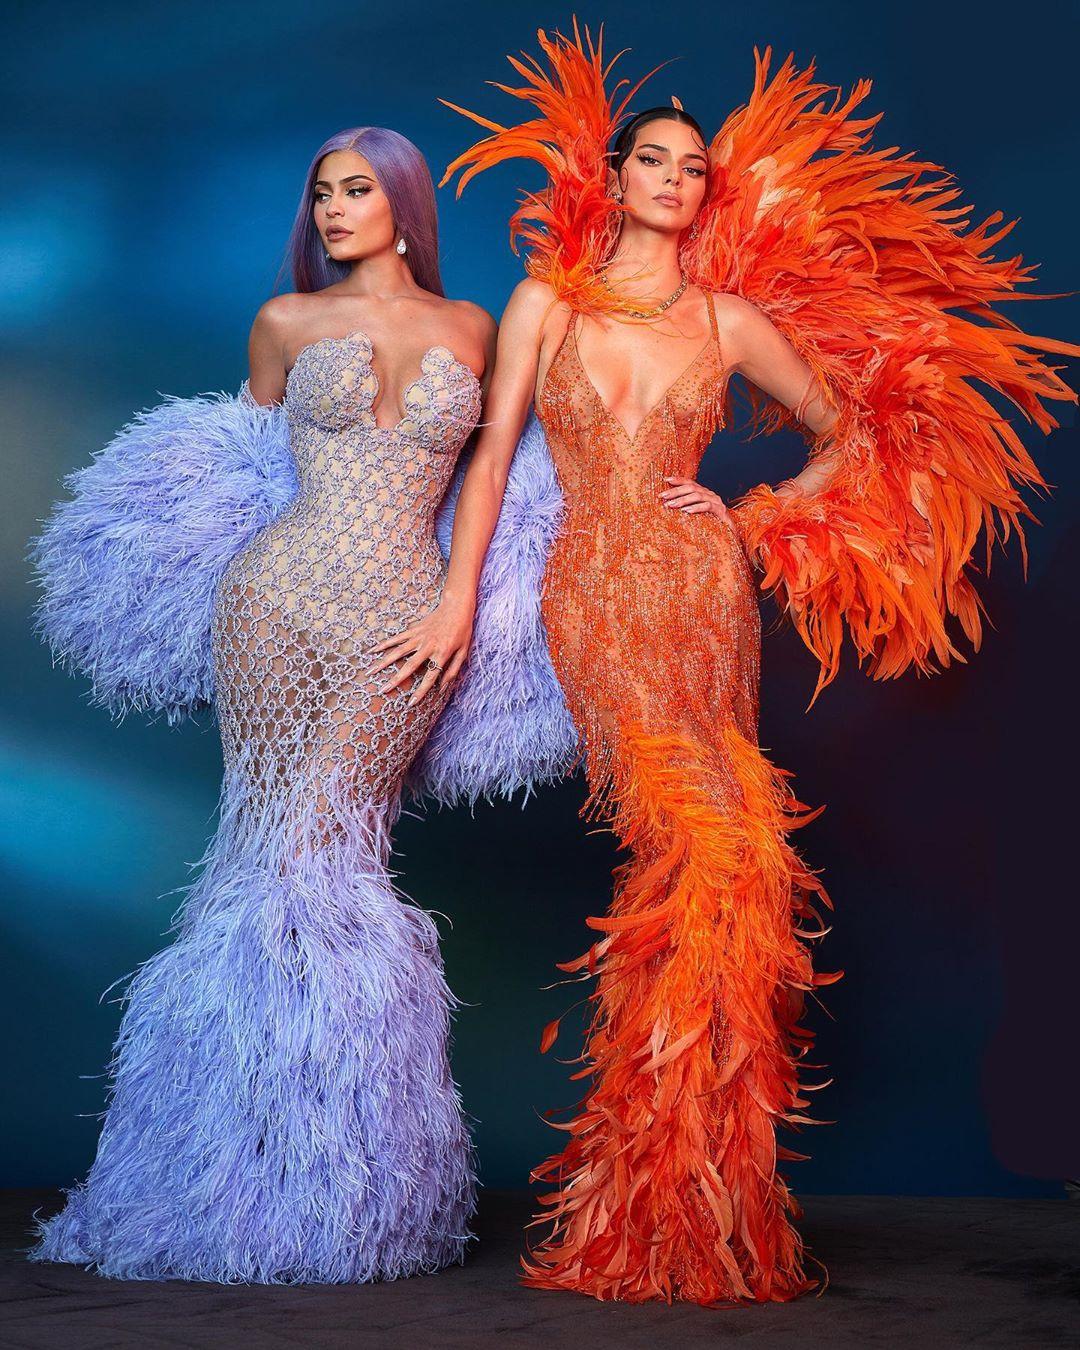 Kylie e Kendall.jpg